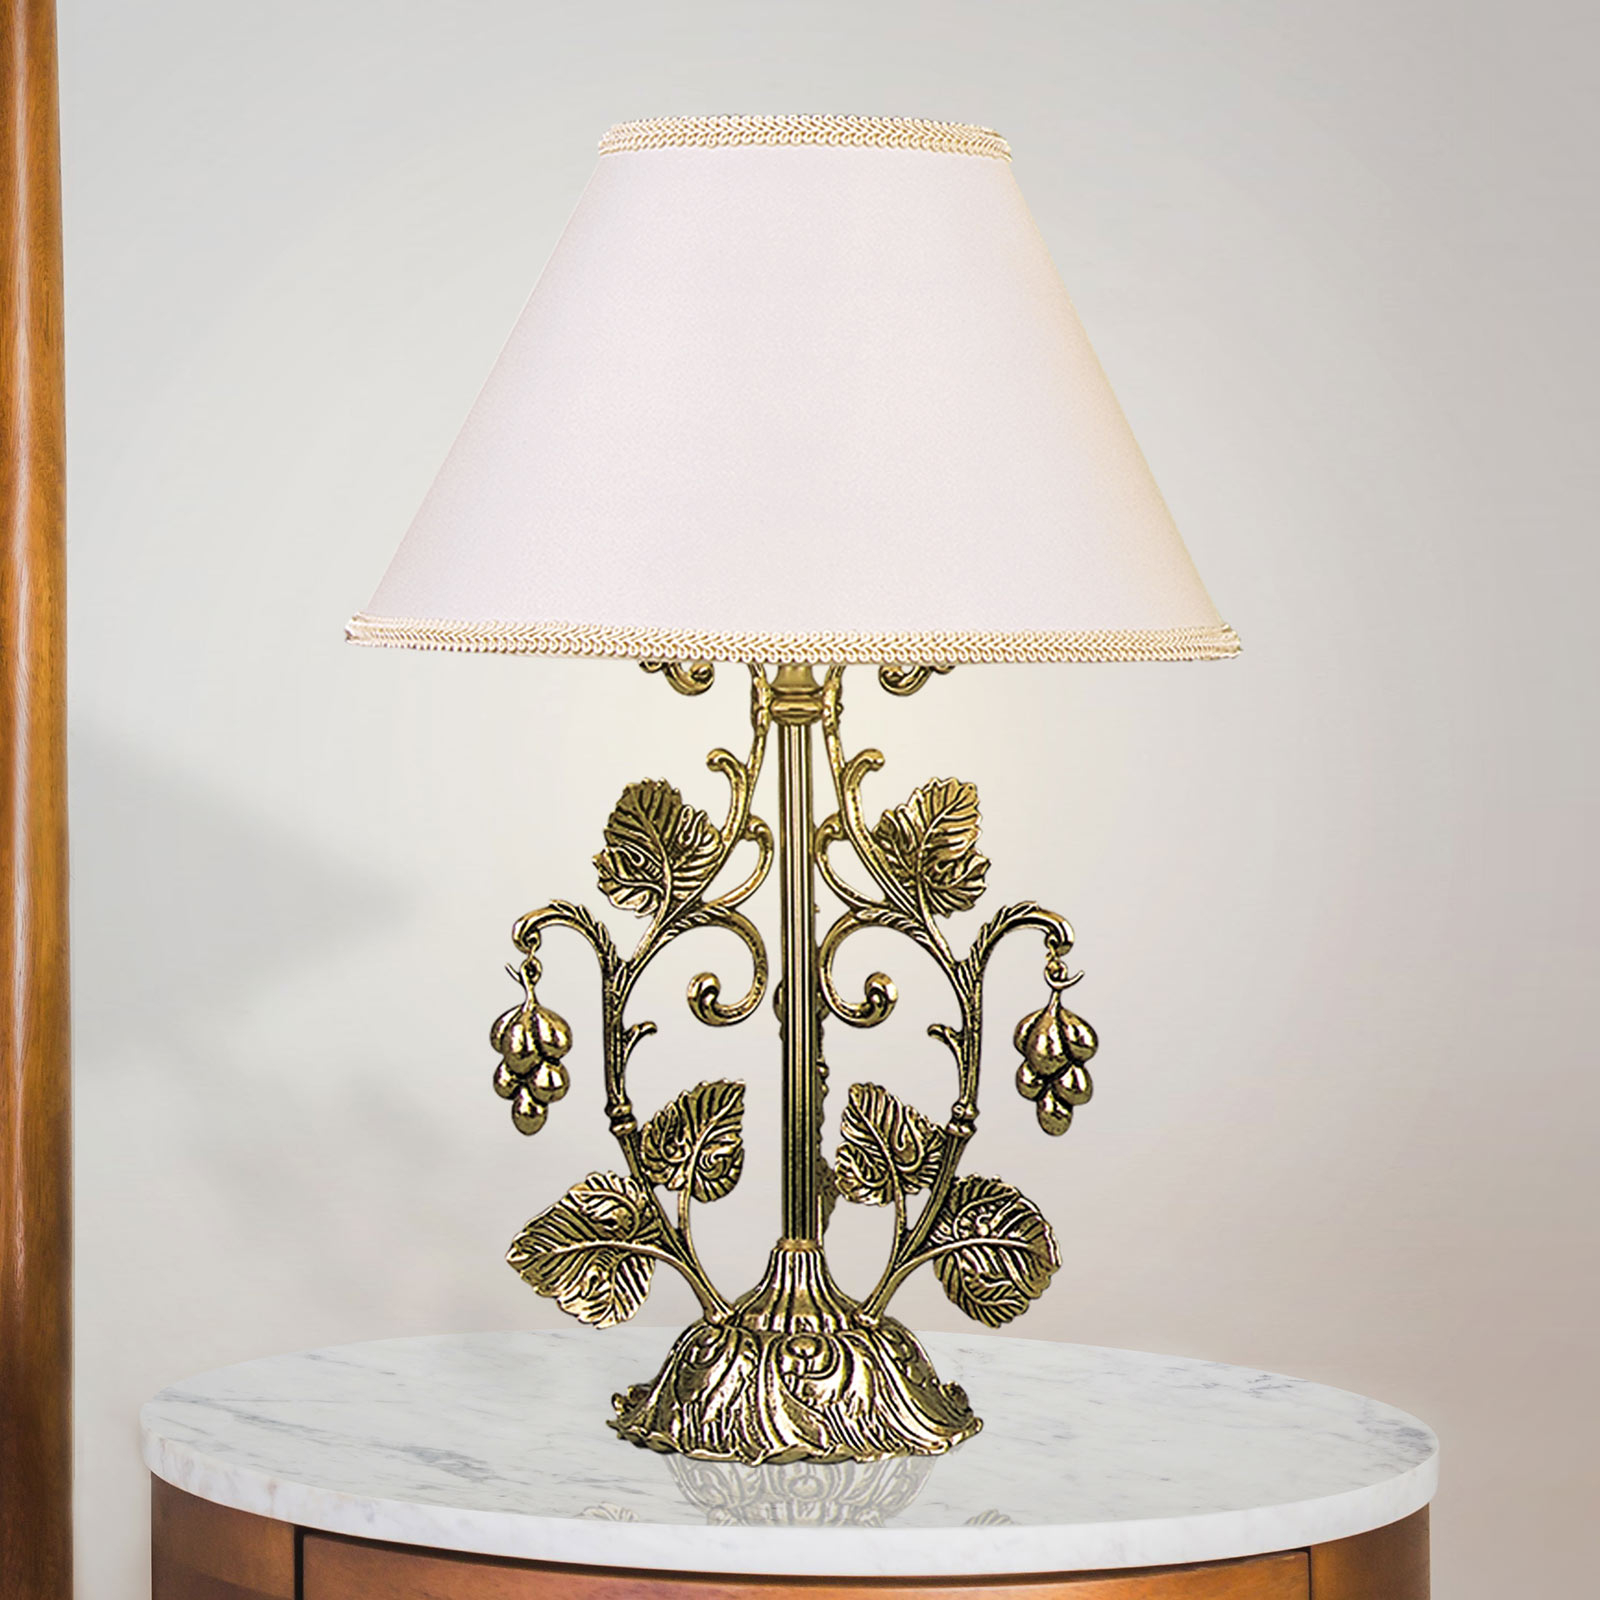 Bordlampe Albero, guld bruneret, hvid